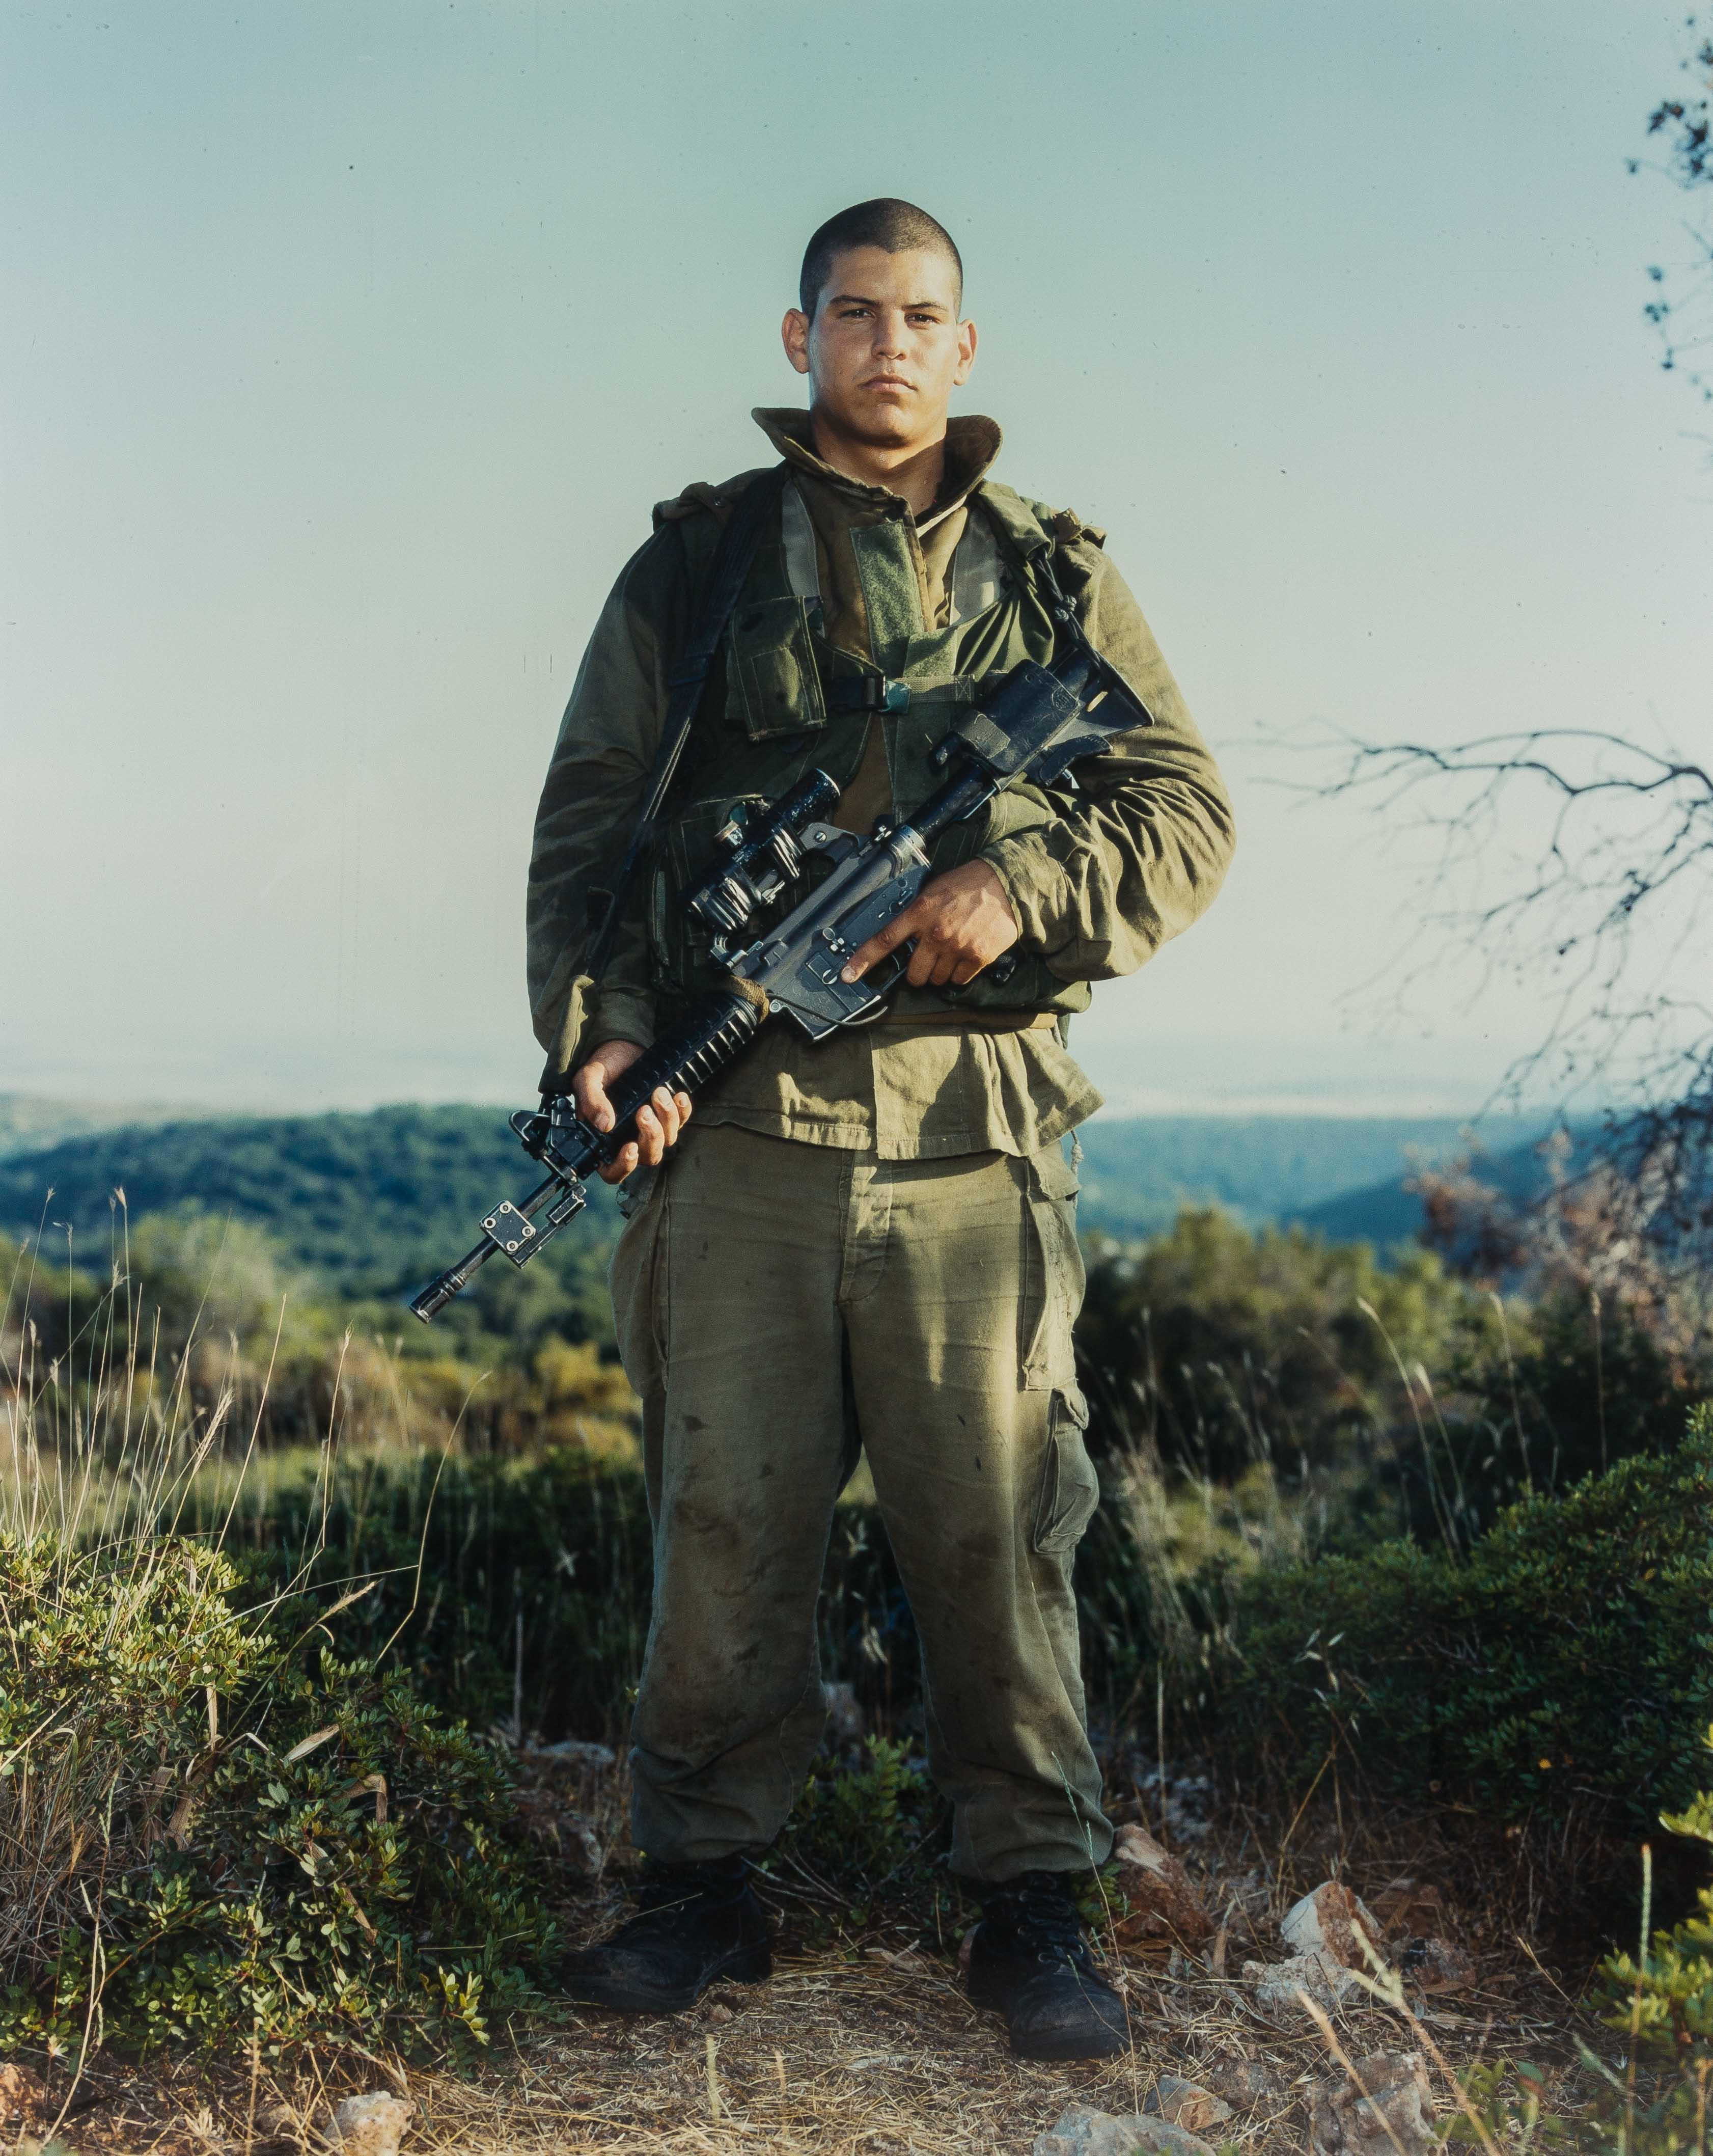 RINEKE DIJKSTRA (1959)Itamar,Golani Brigade,Orev Unit,Elyakim,Israel mei 29/1999